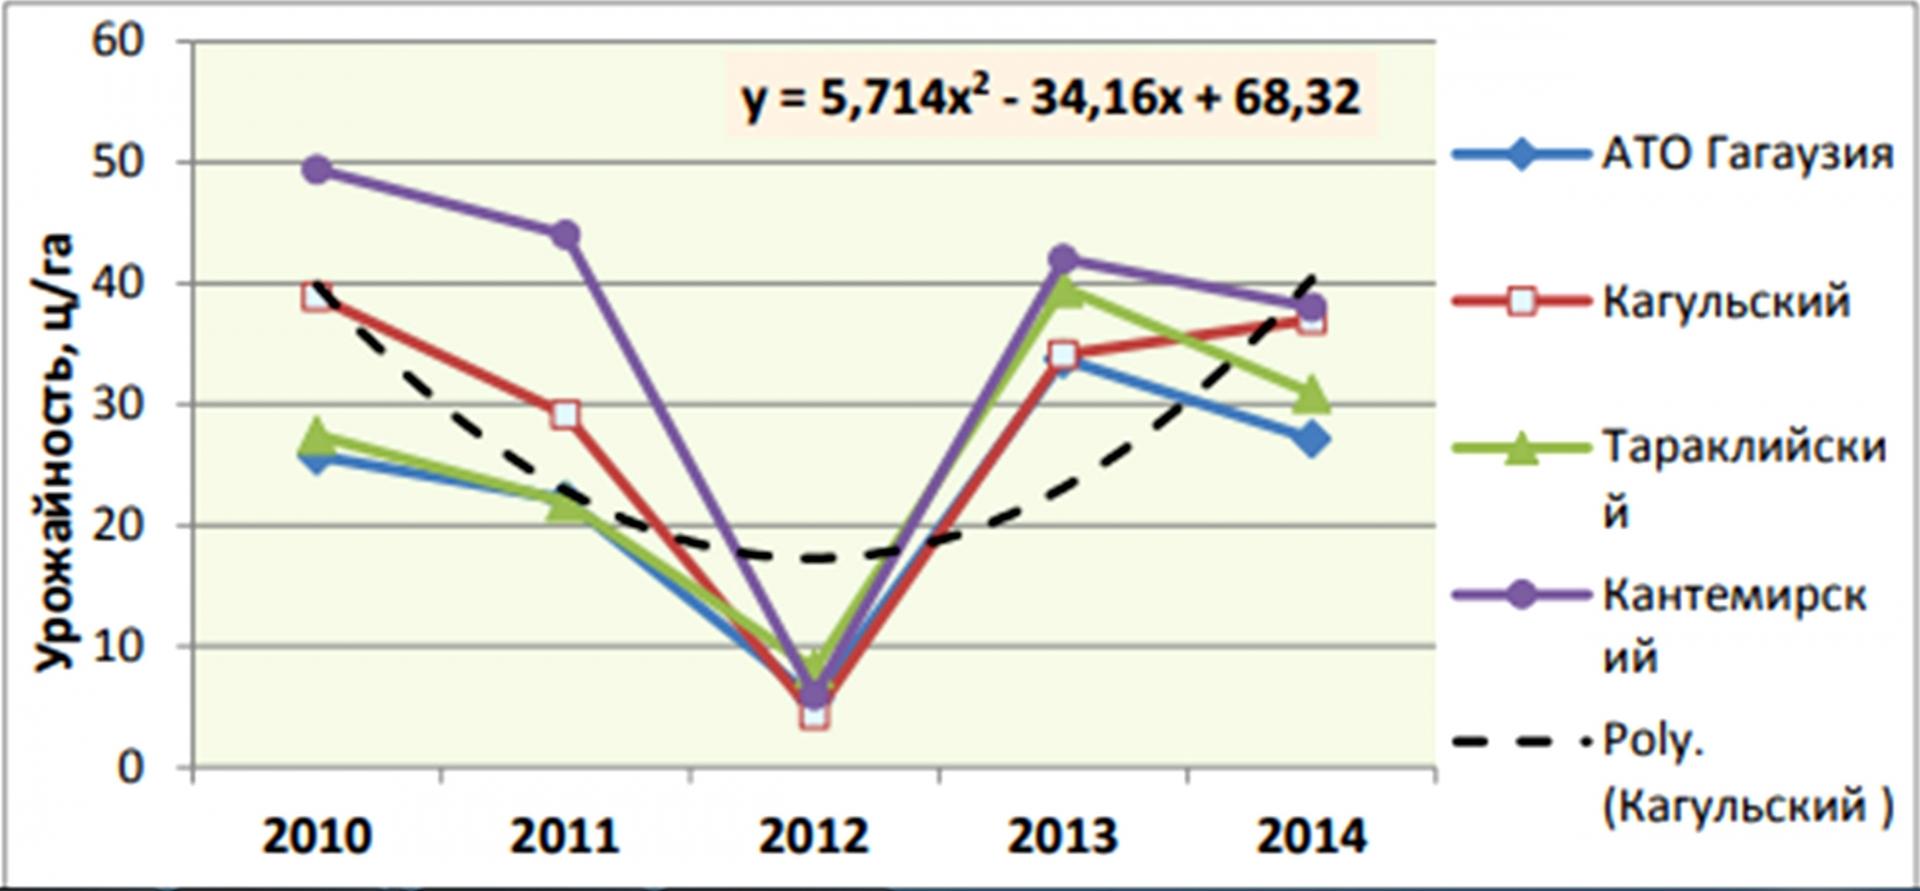 Рис. 5. Динамика урожайности кукурузы в южных районах Молдавии за 2010–2014 гг